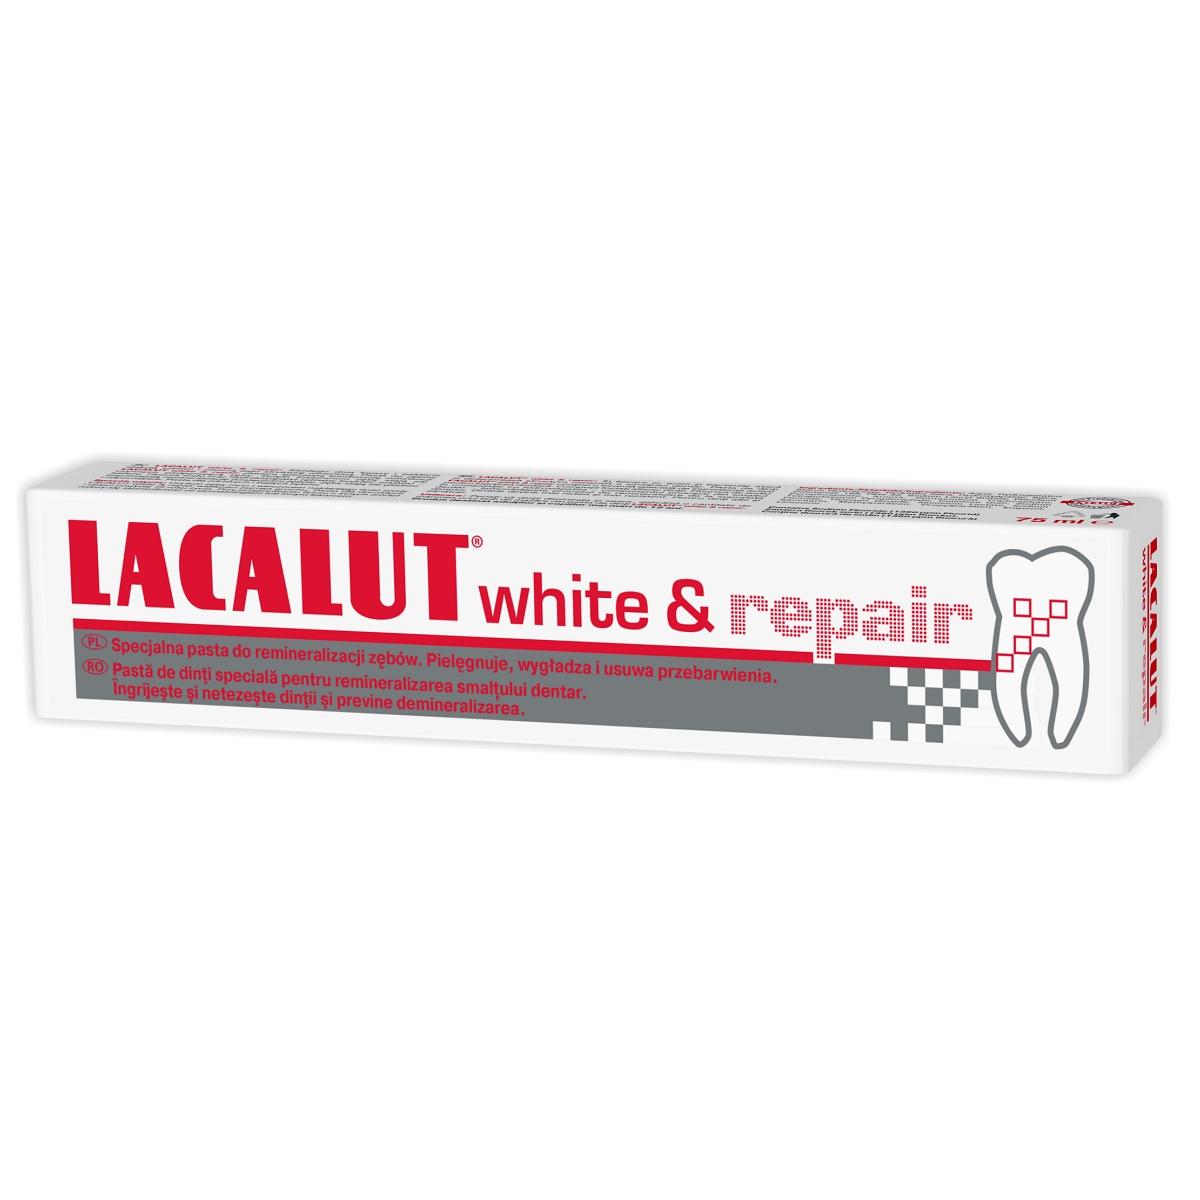 Pastă de dinți medicinală Lacalut White Repair, 75 ml, Theiss Naturwaren